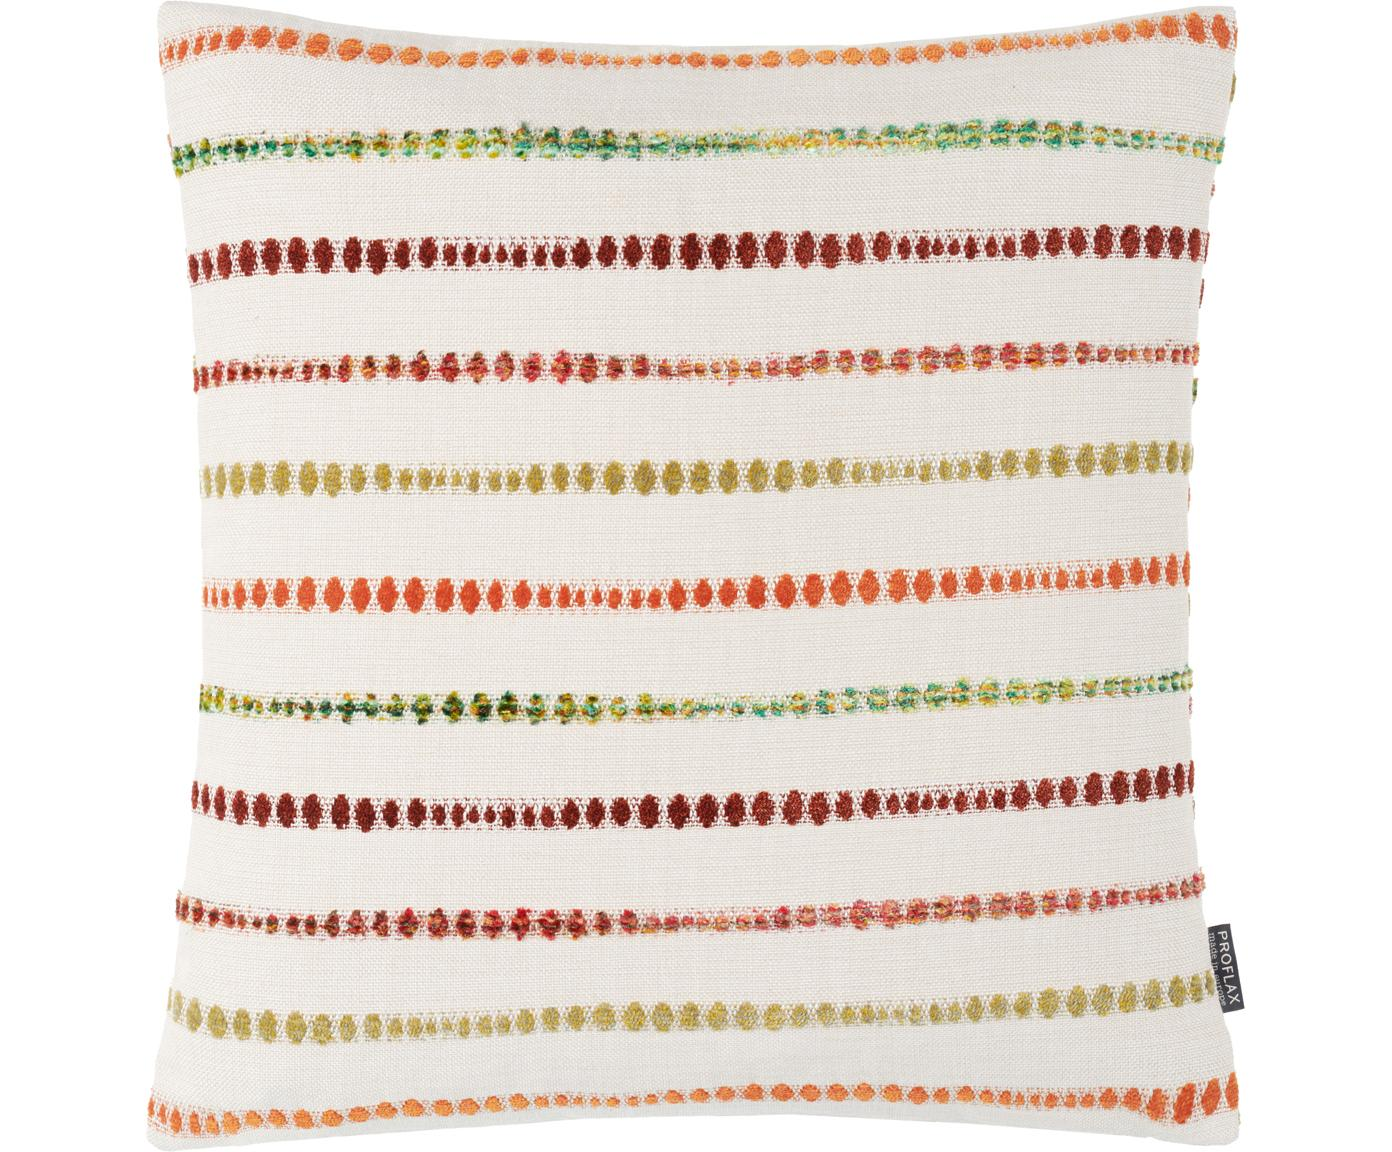 Funda de cojín Alfonso, 52%poliéster, 48%algodón, Blanco, multicolor, An 45 x L 45 cm